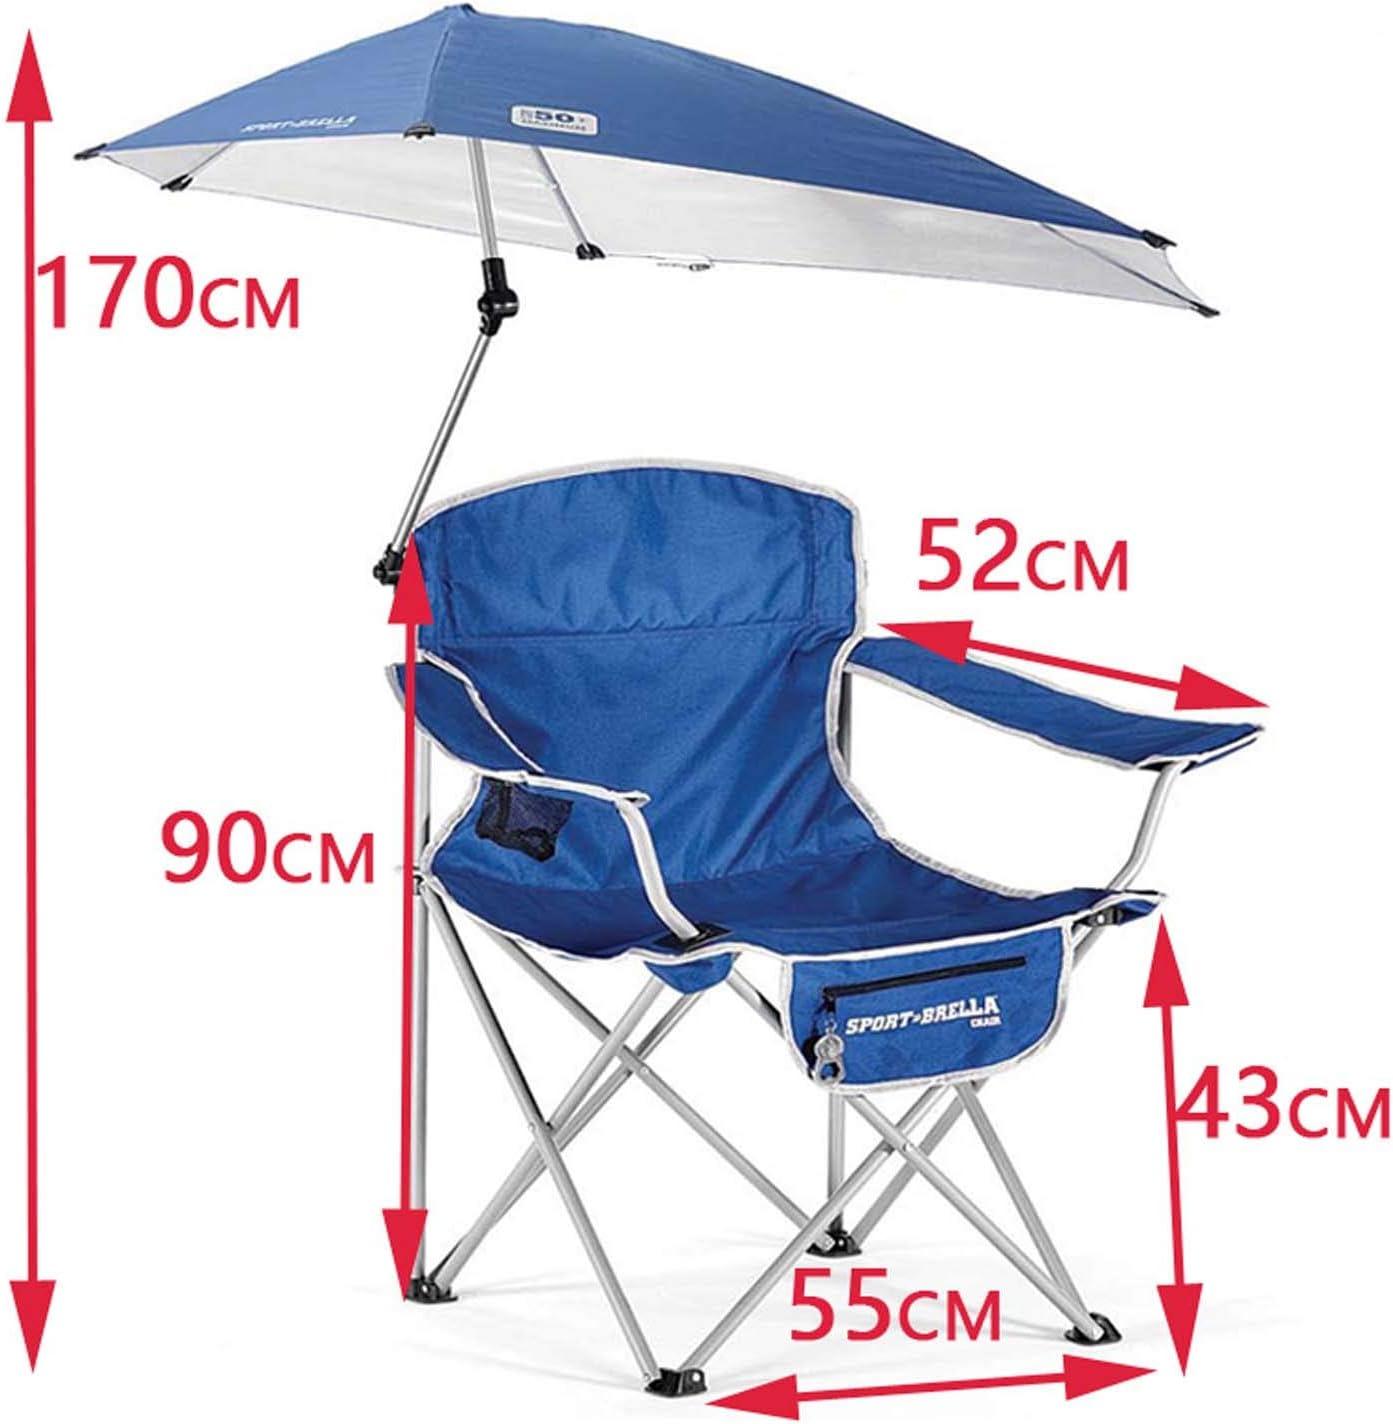 Pliante Camping WJHJBB extérieur Chaise de Dossier de N8vnwyOm0